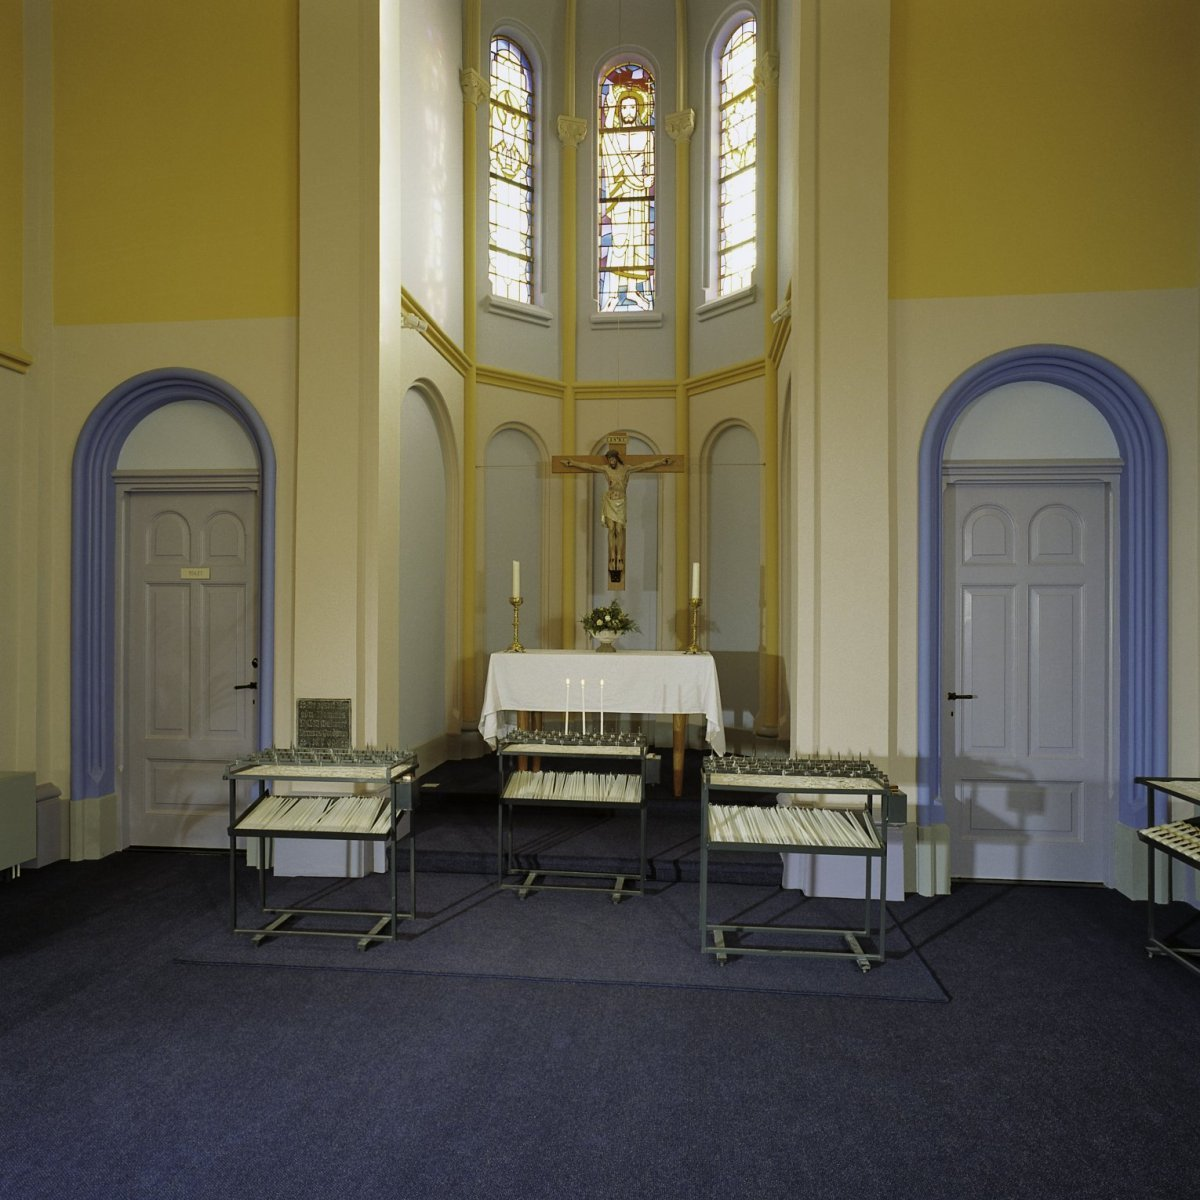 File:Interieur, overzicht koor - Gouda - 20375785 - RCE.jpg ...